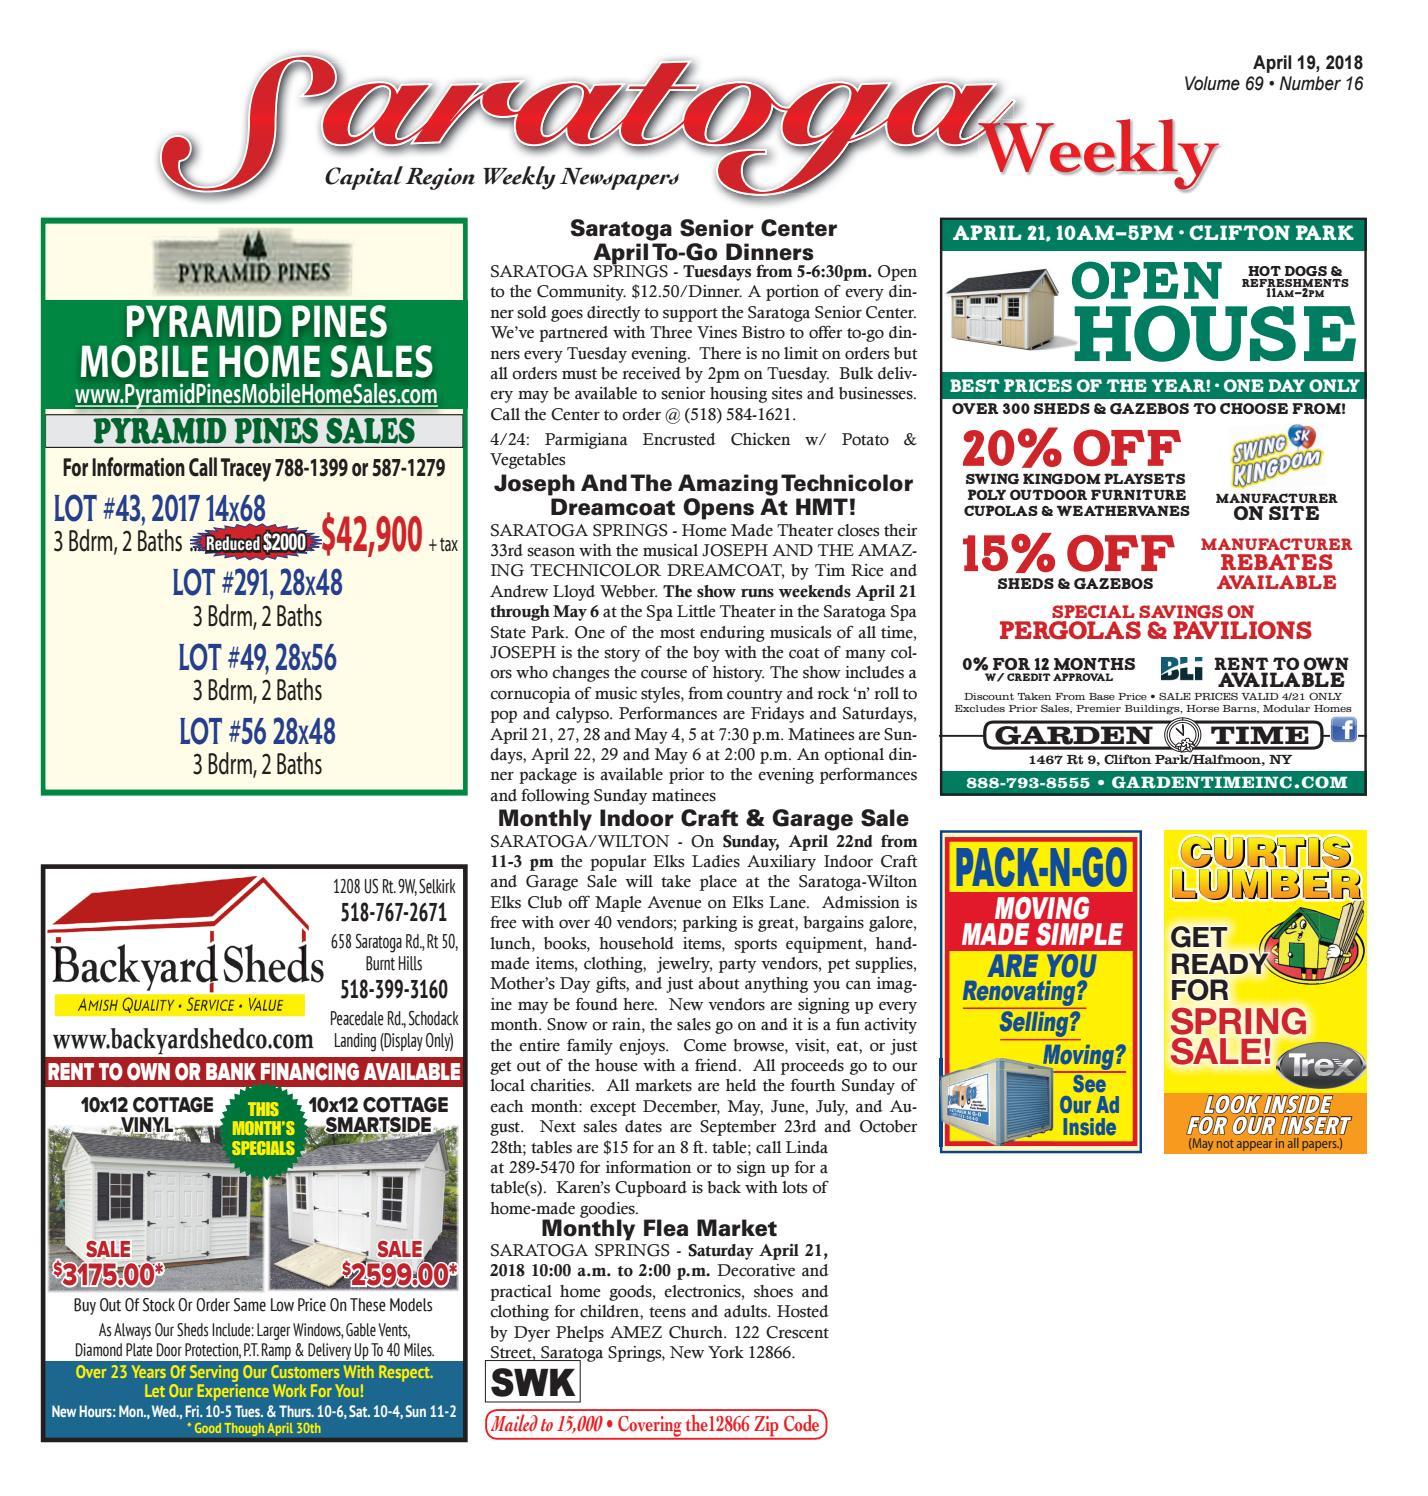 7cf645c6a2 Saratoga Weekly 041918 by Capital Region Weekly Newspapers - issuu